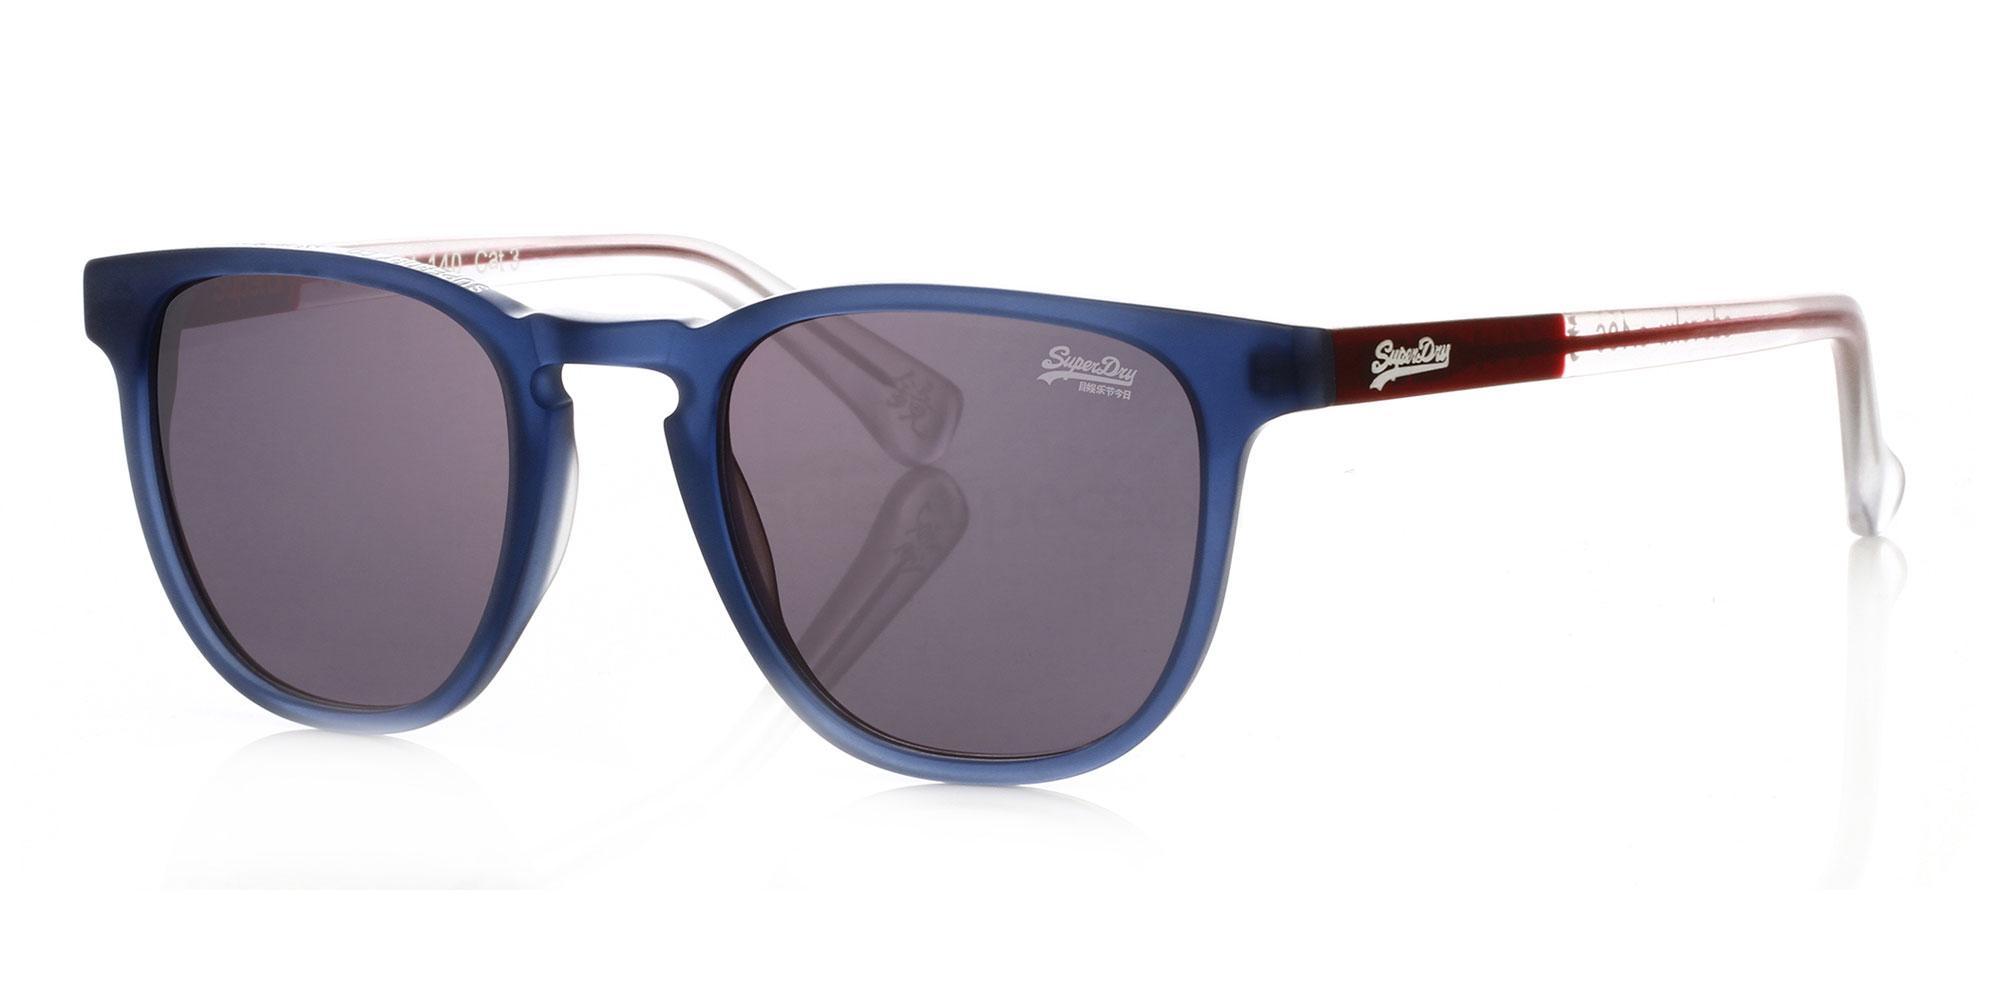 Superdry sunglasses wayfarer